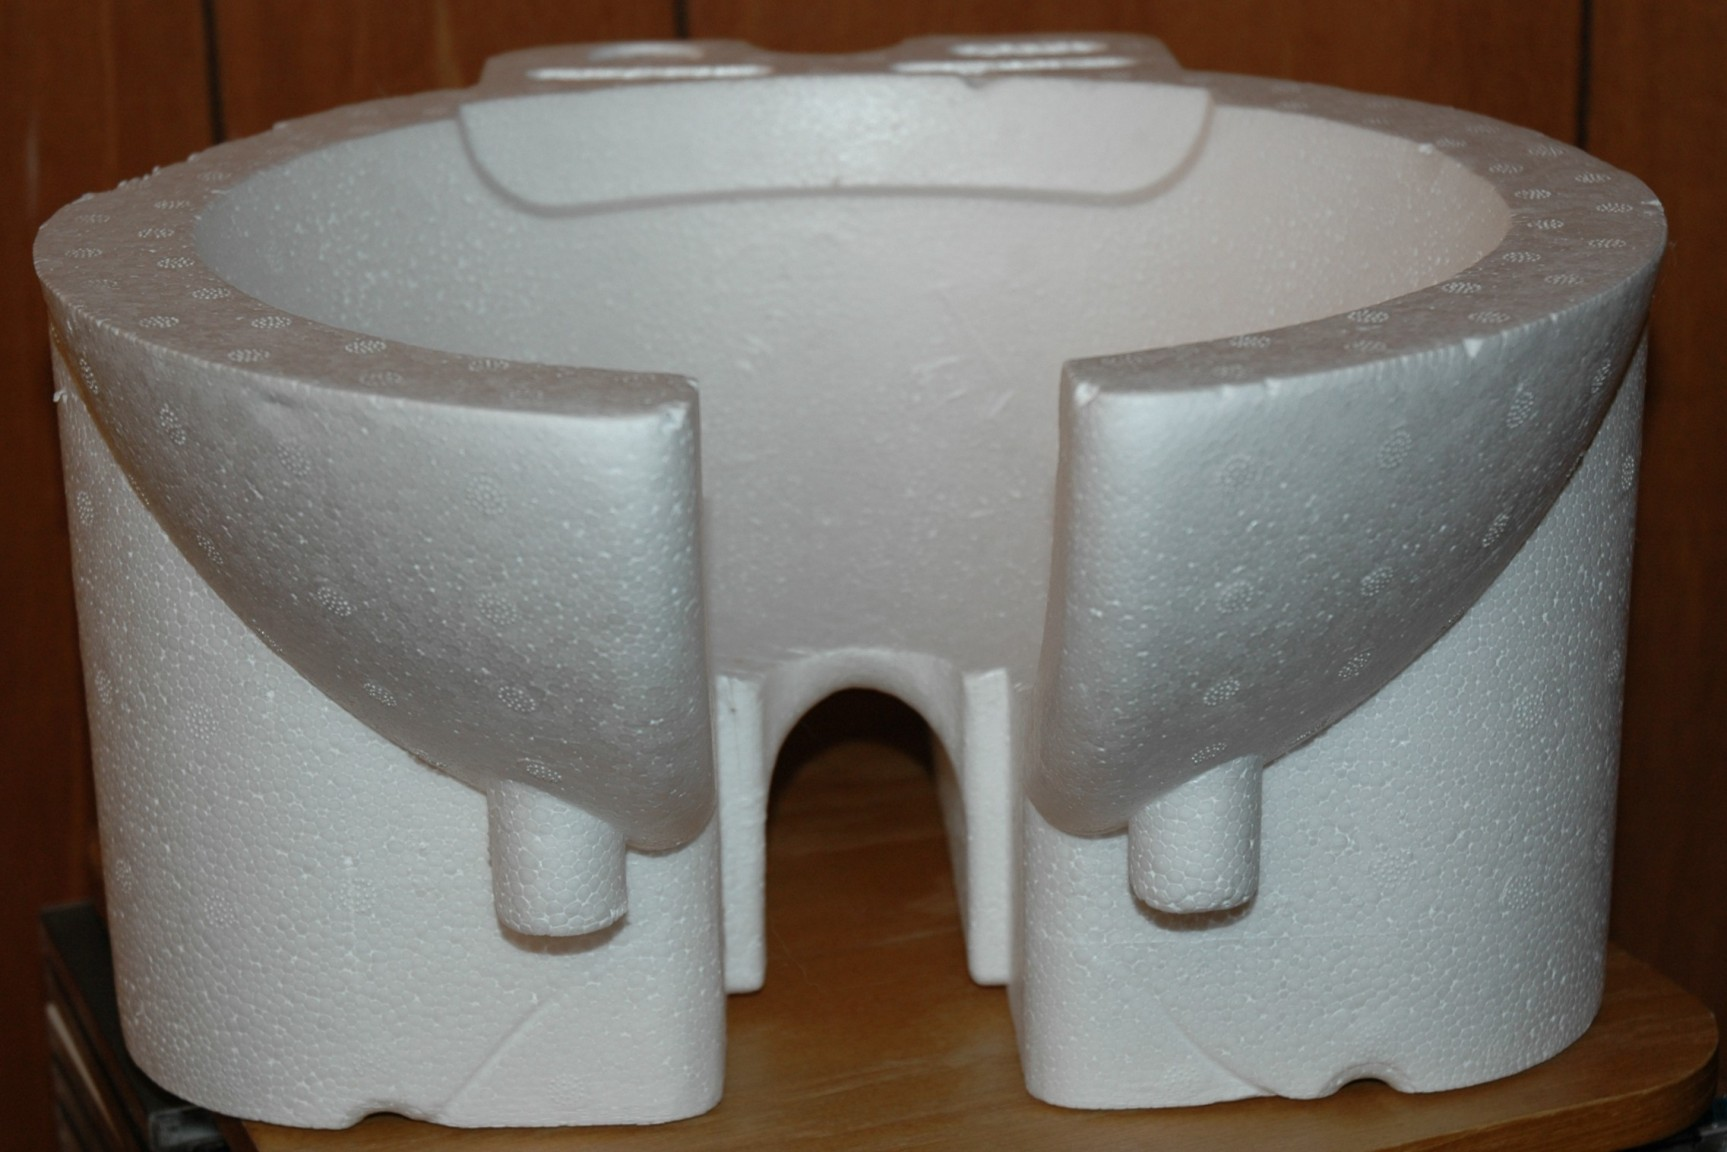 iMac Toilet 2